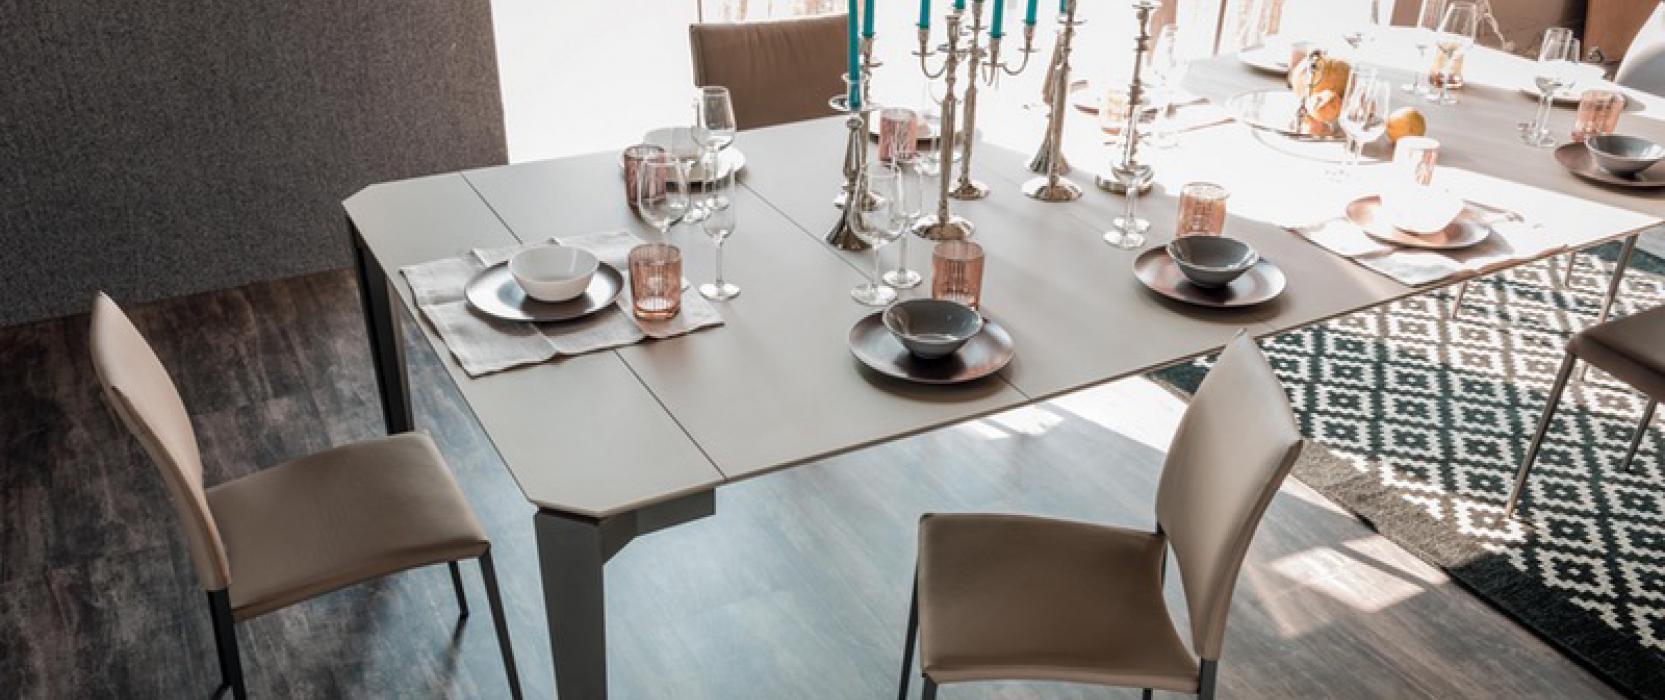 Boston fine Italian Furniture elegant table settings dinner party